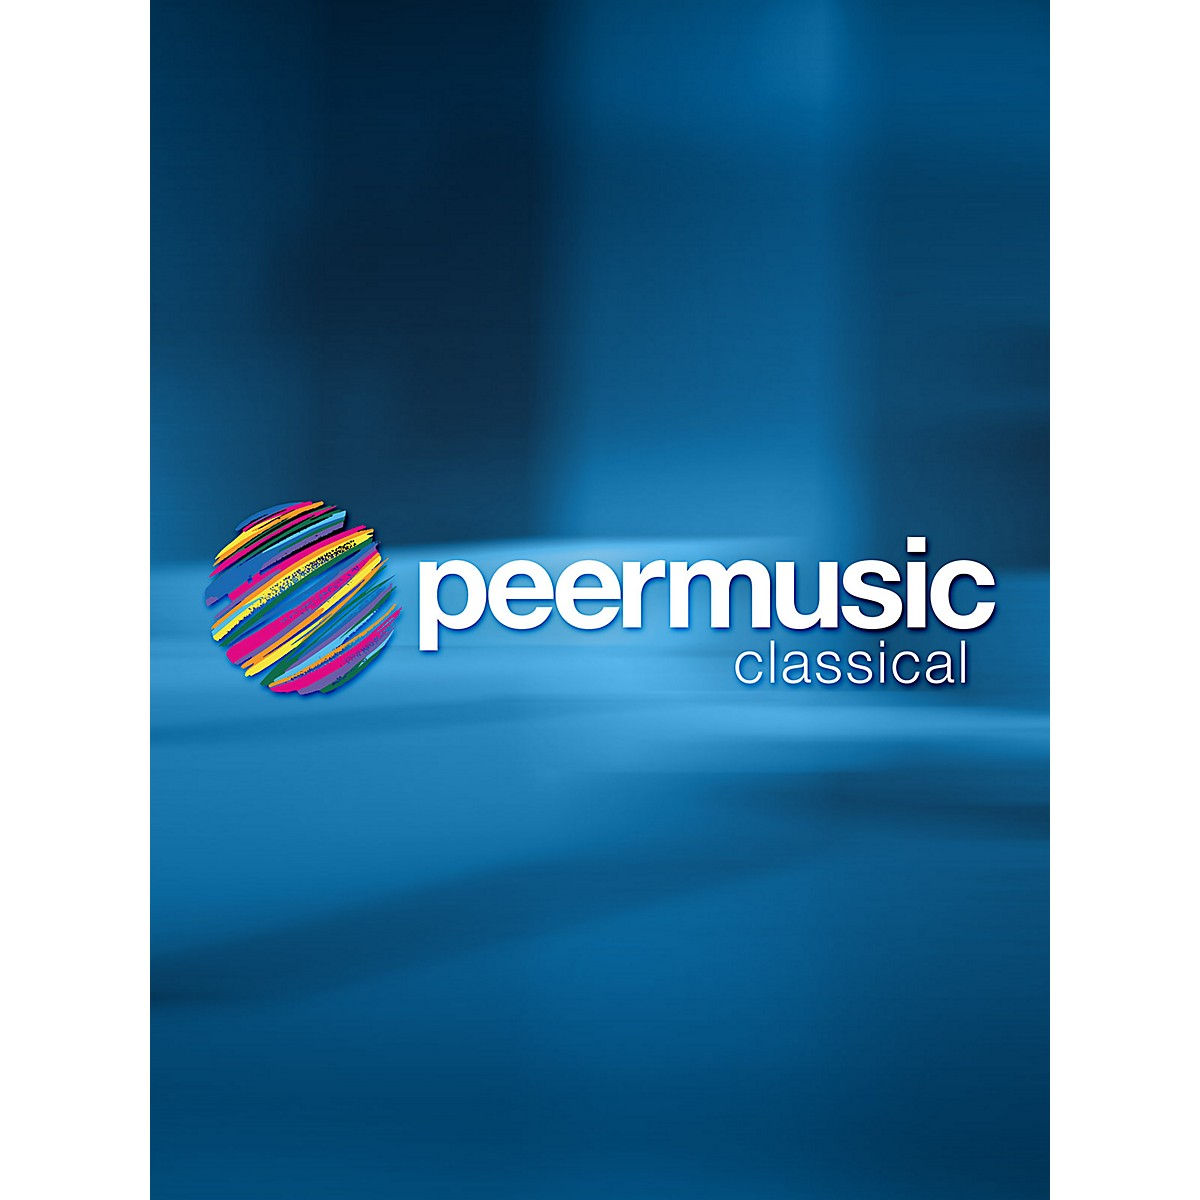 Peer Music Technical Studies Peermusic Classical Series